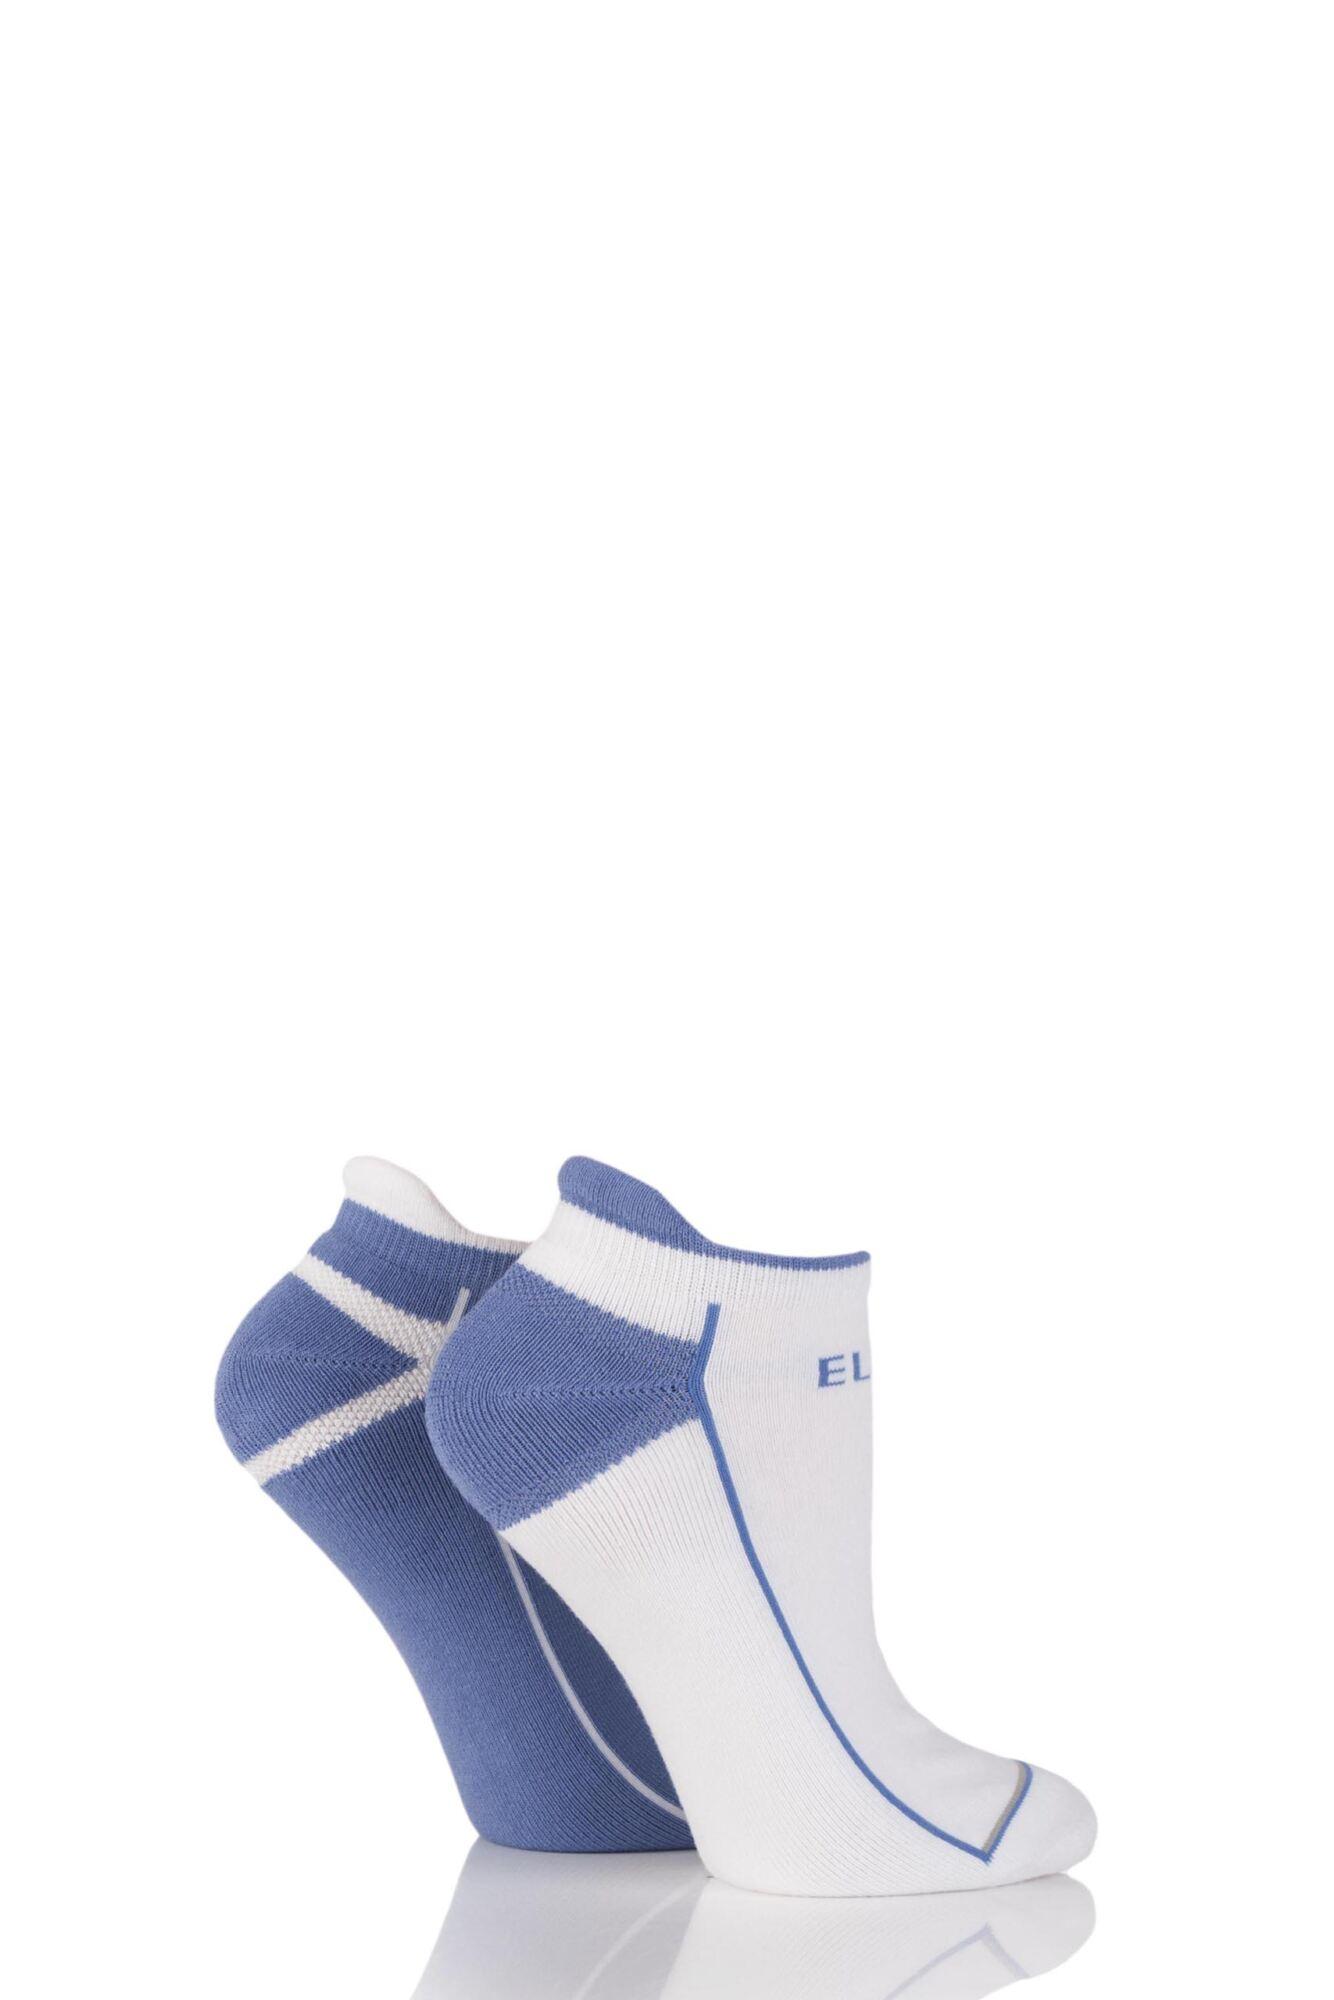 2 Pair Sports Trainer Socks Ladies - Elle